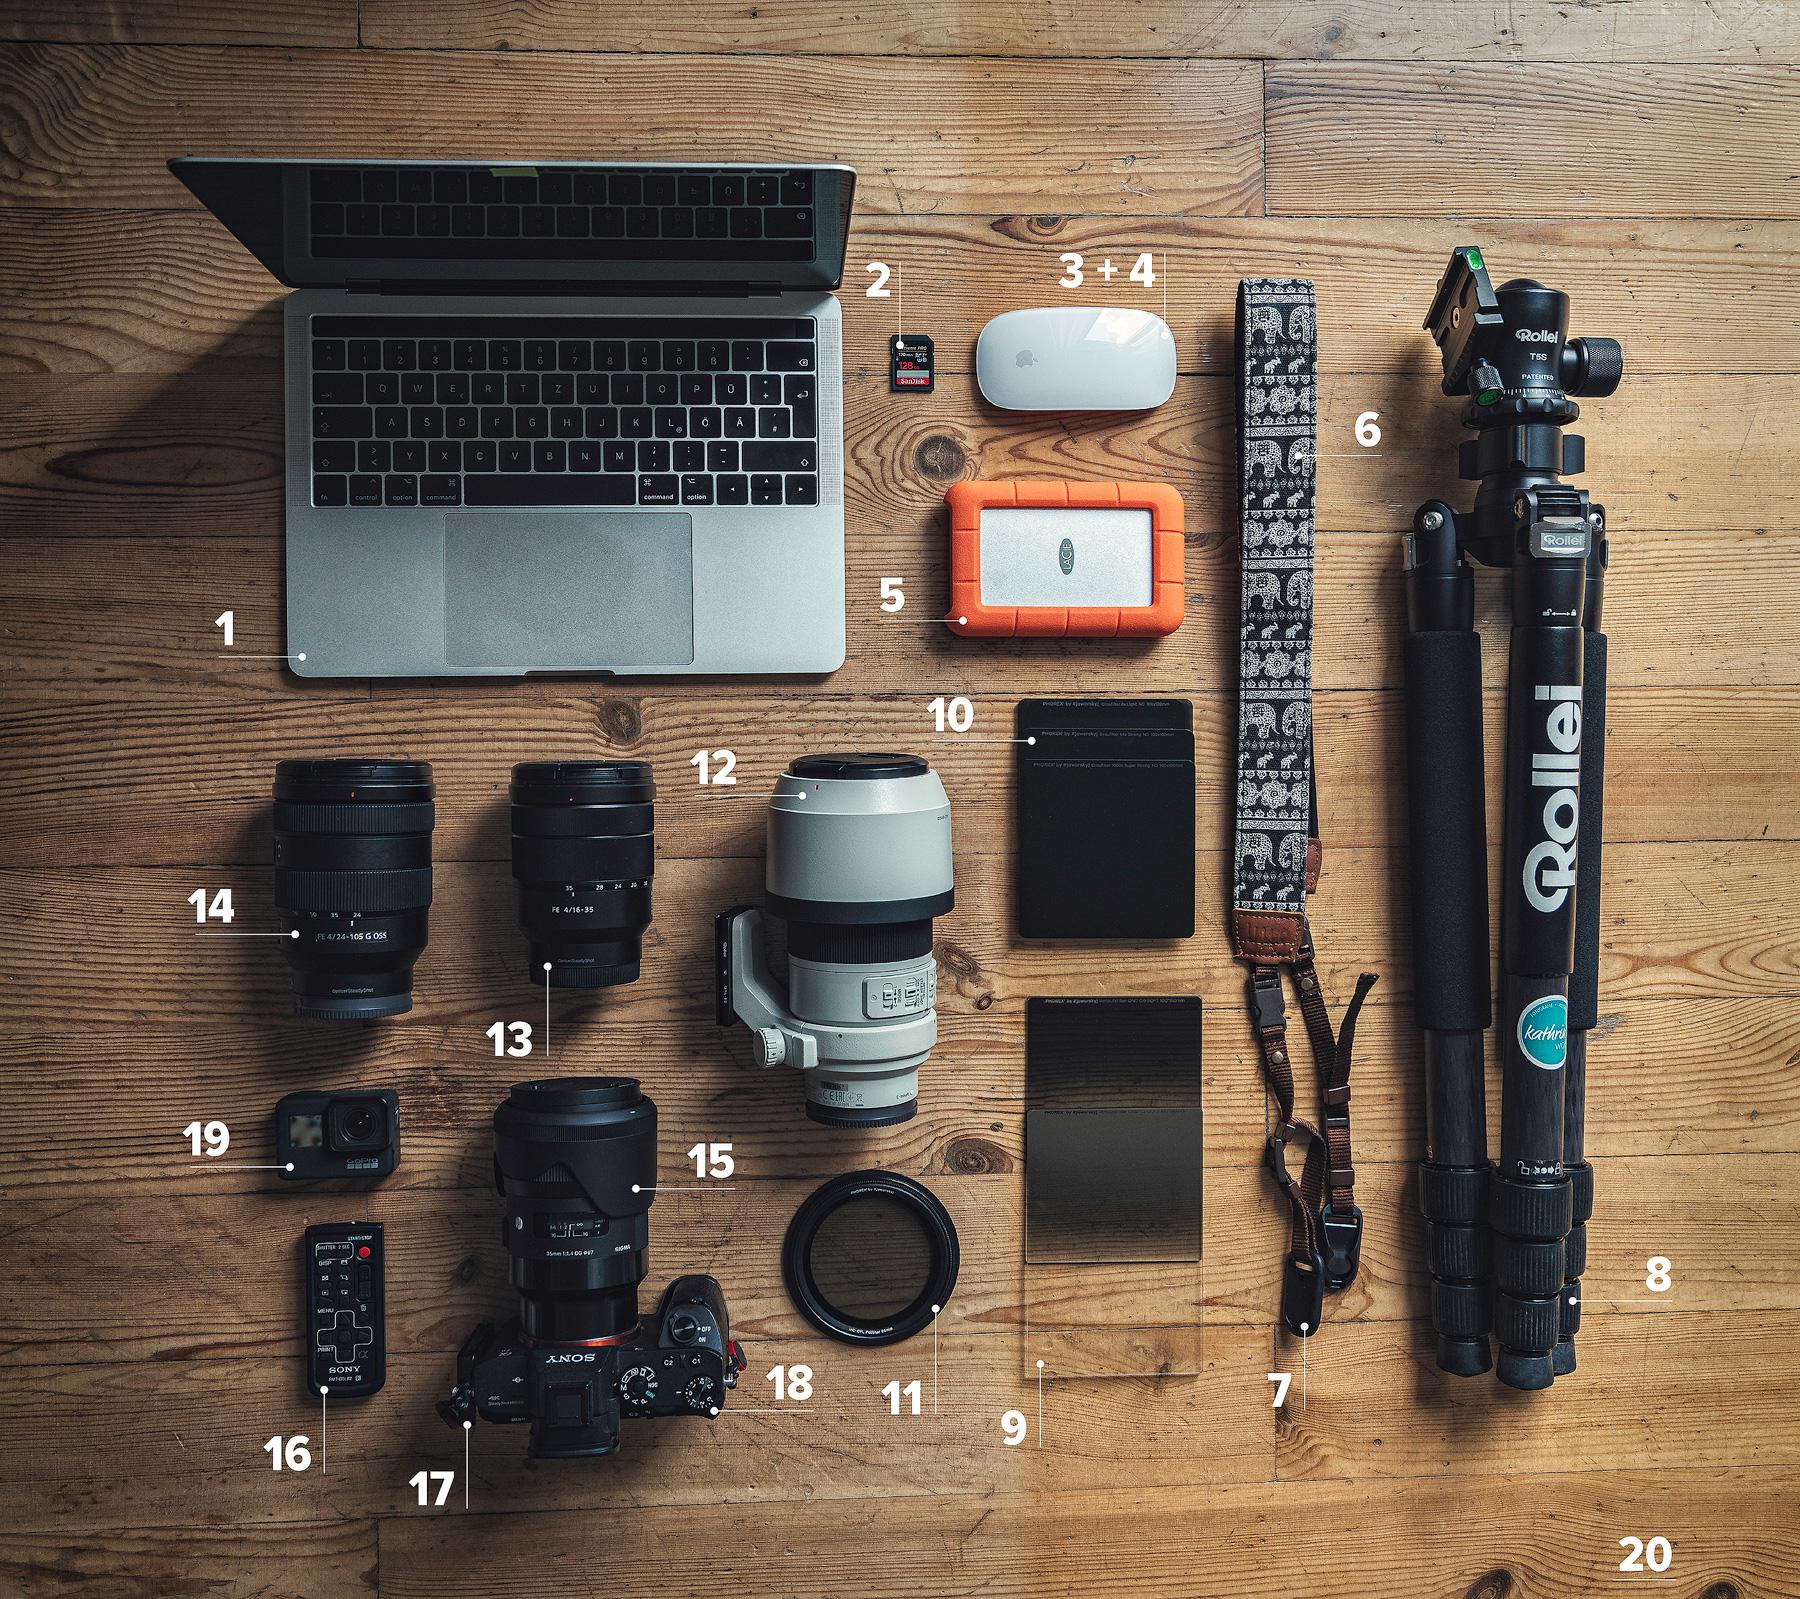 Equipment, Reiseblog, Fotoblog,Sony, Kameras, Stativ, Rollei, Kathrin's World, kathrinsworld, Kathrin Schlott